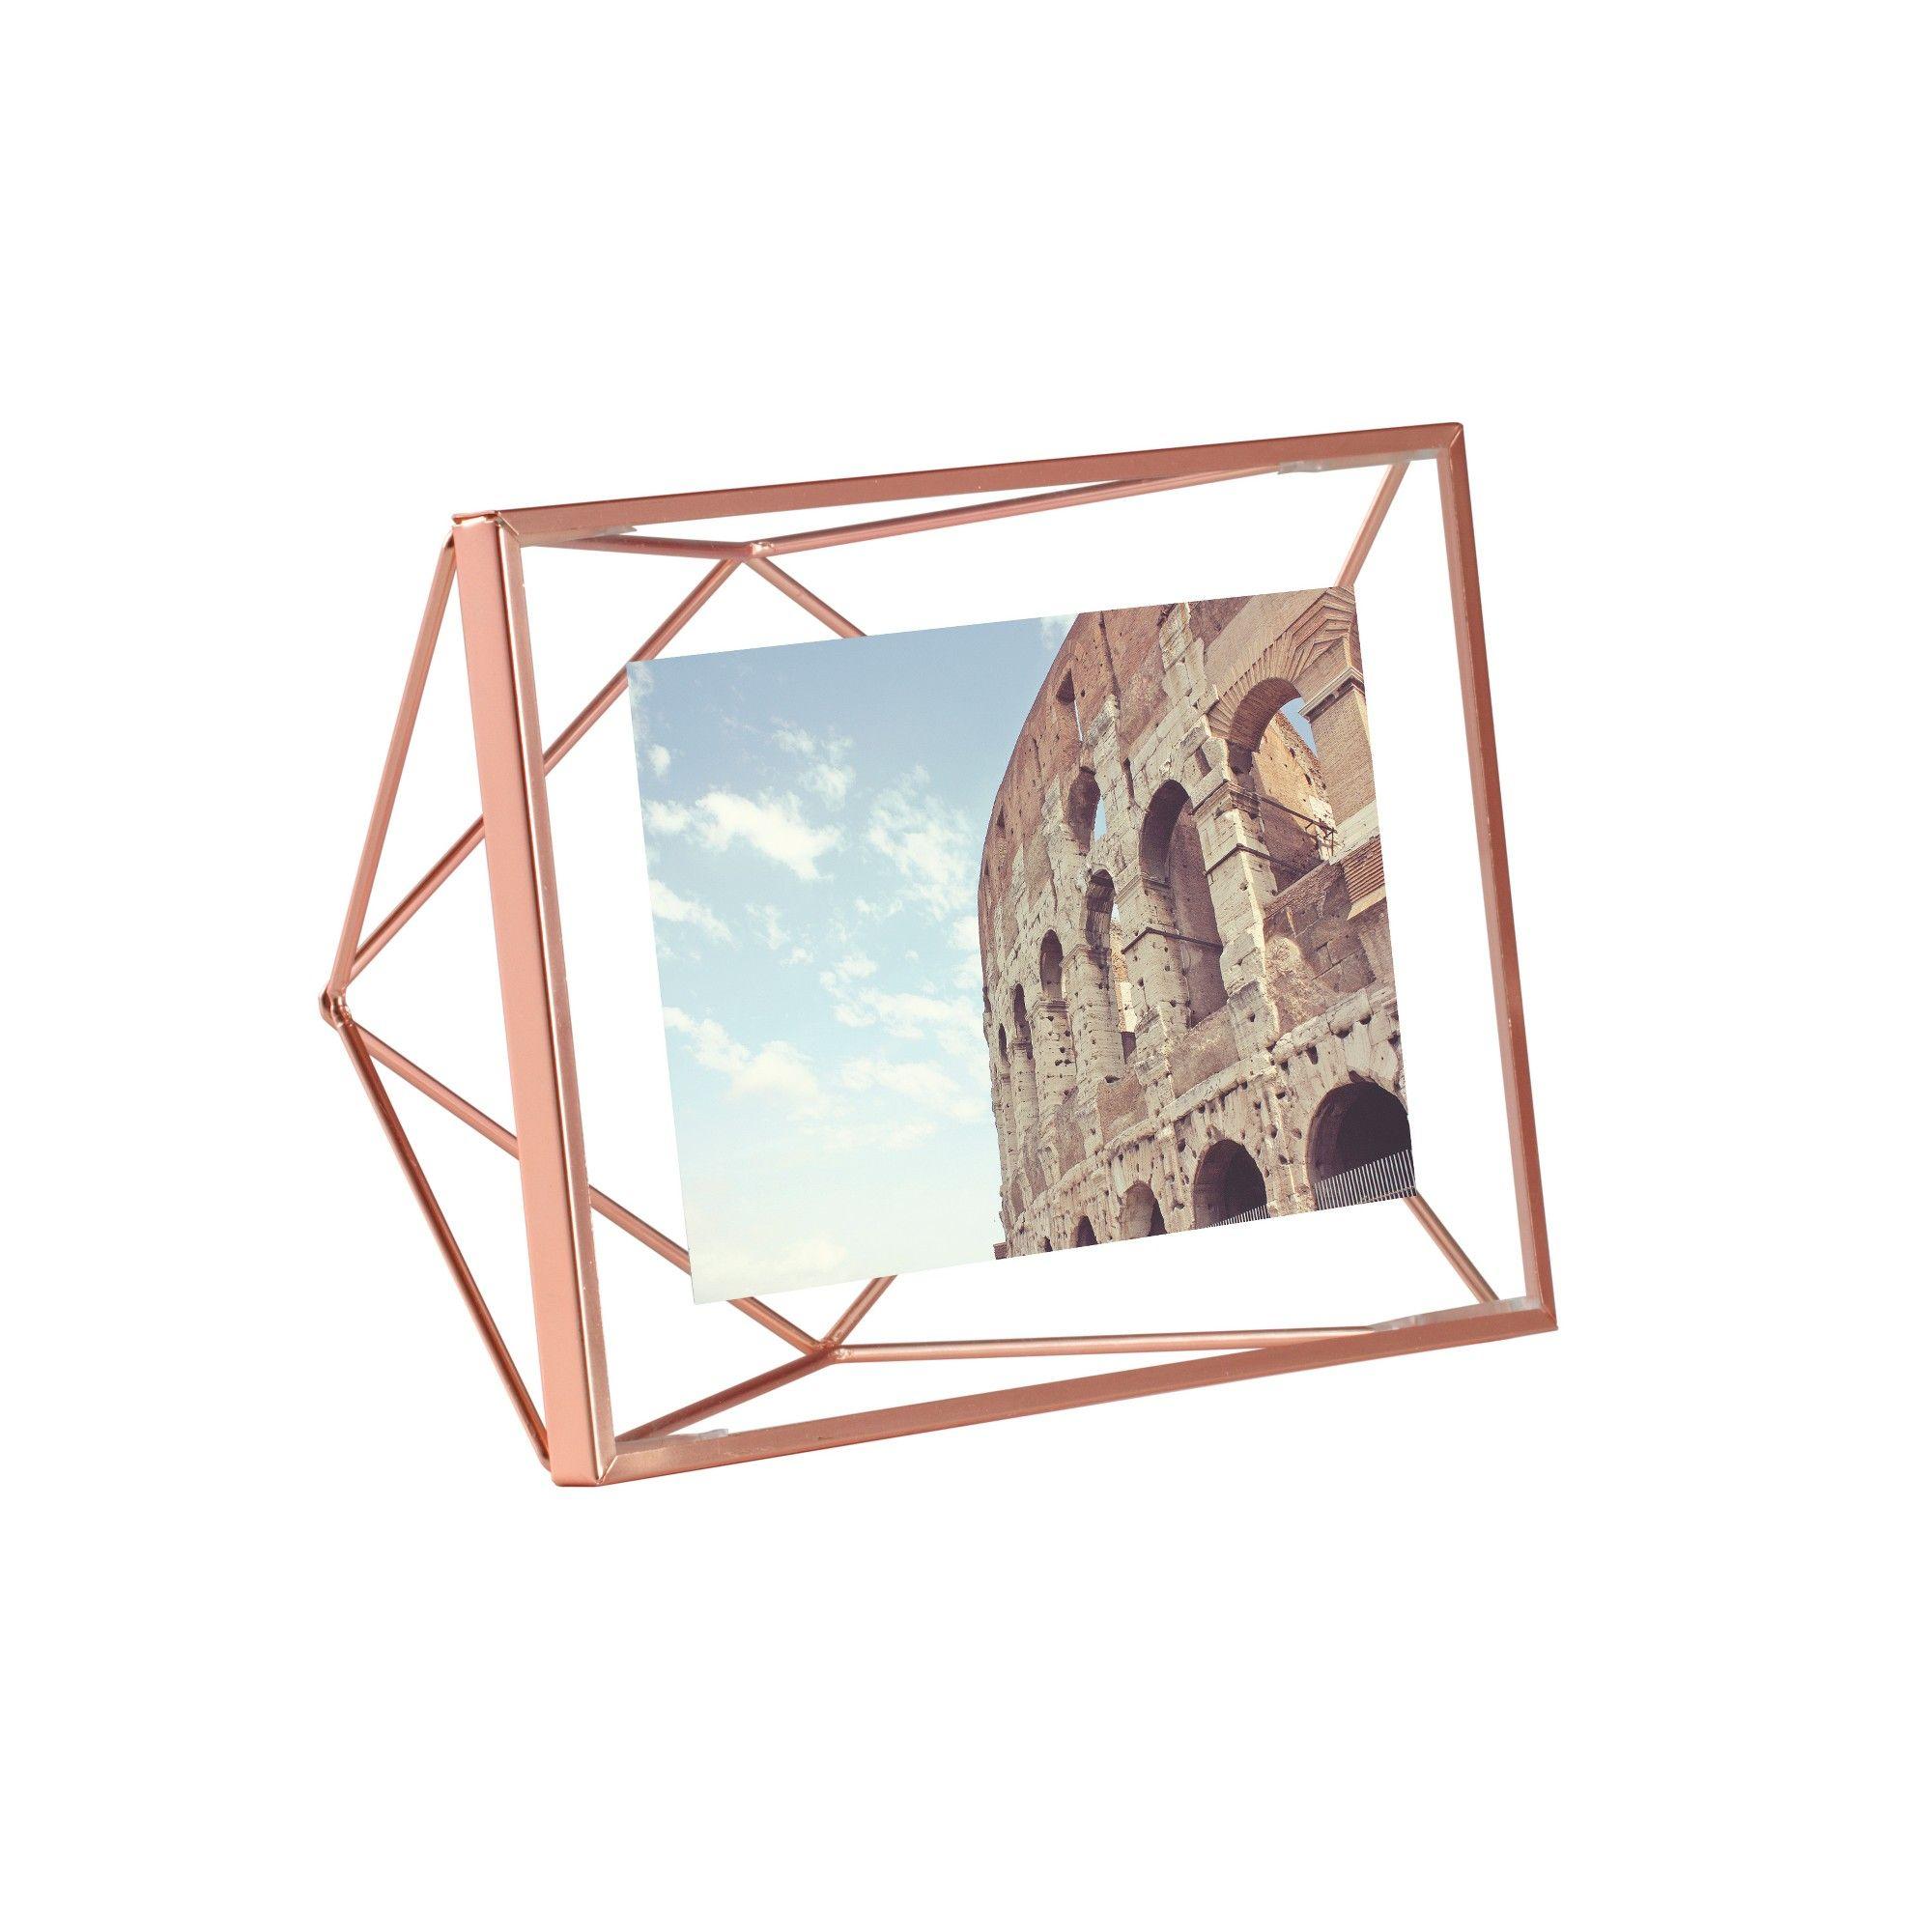 Schön 4x6 Multifotorahmen Fotos - Benutzerdefinierte Bilderrahmen ...